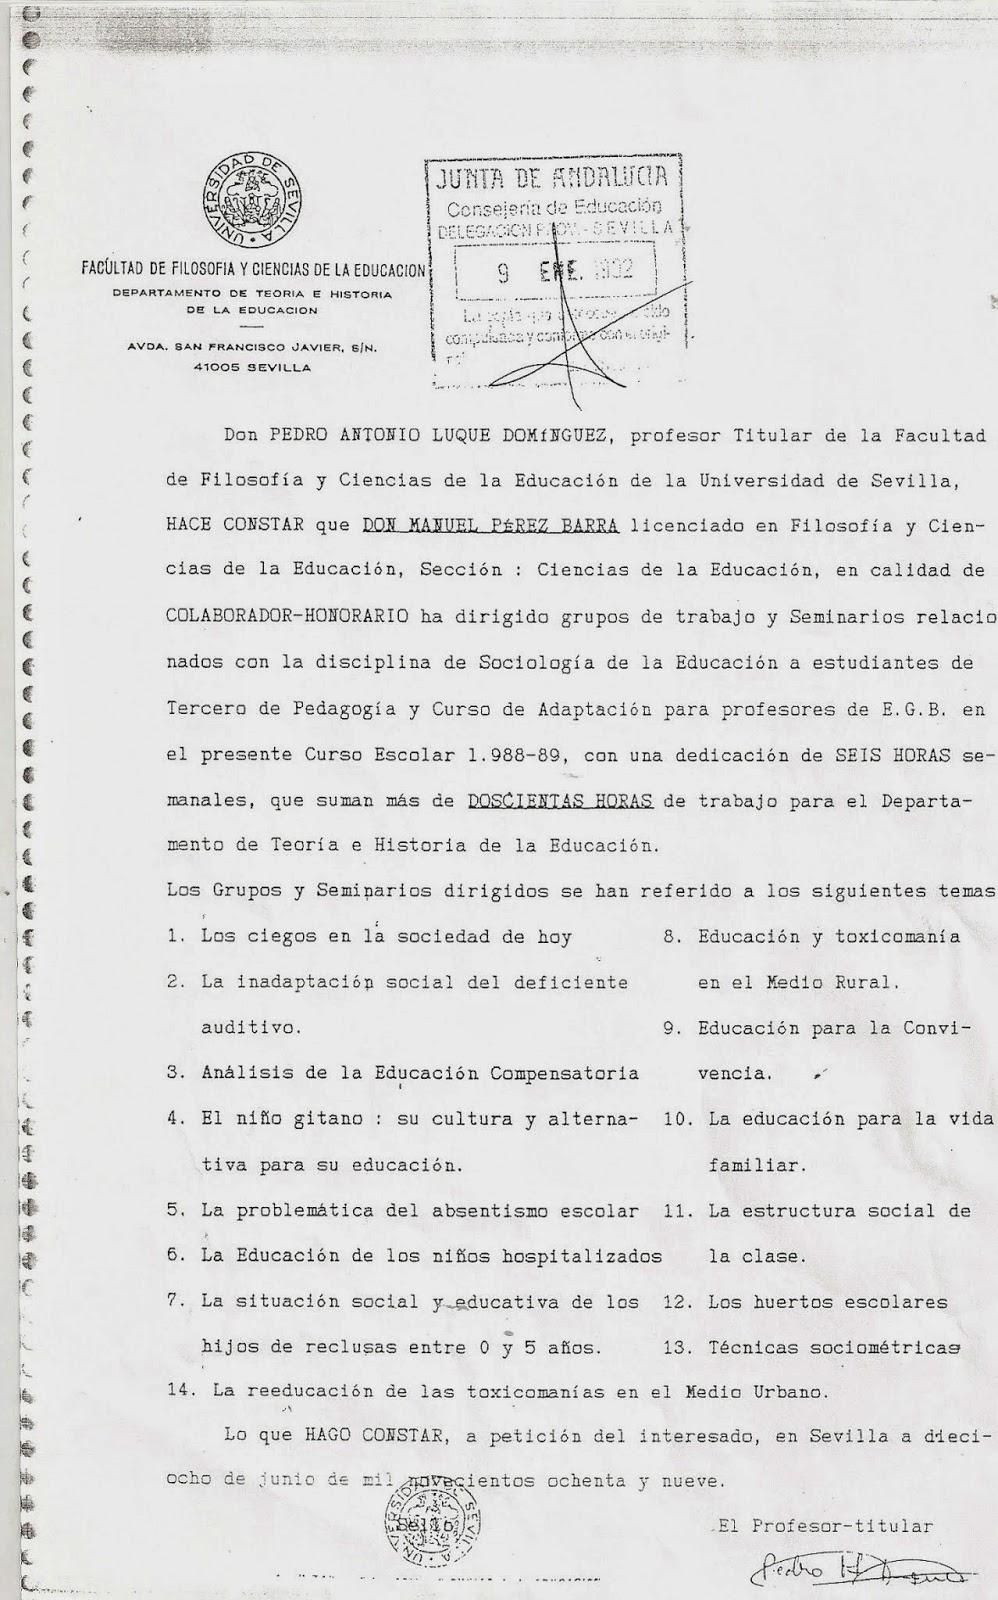 Manuel Pérez Barra: VIDA PROFESIONAL DE MANUEL PEREZ BARRA - CURRICULUM